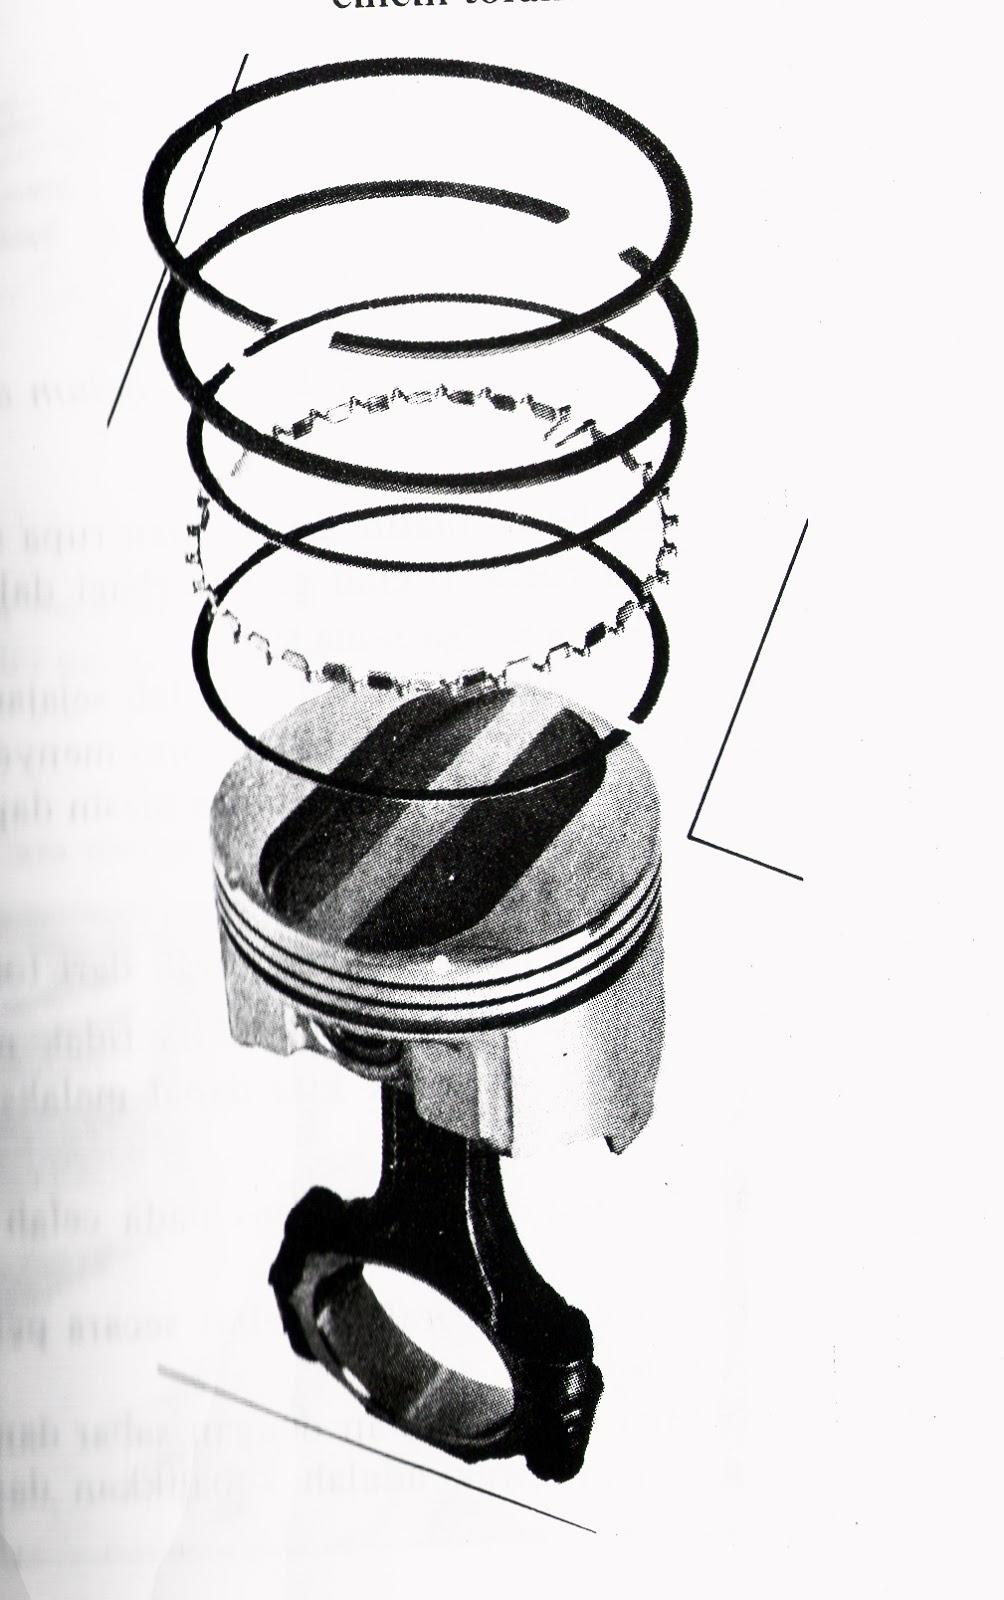 otomotif: cara memasang kelengkapan piston di dalam silinder motor